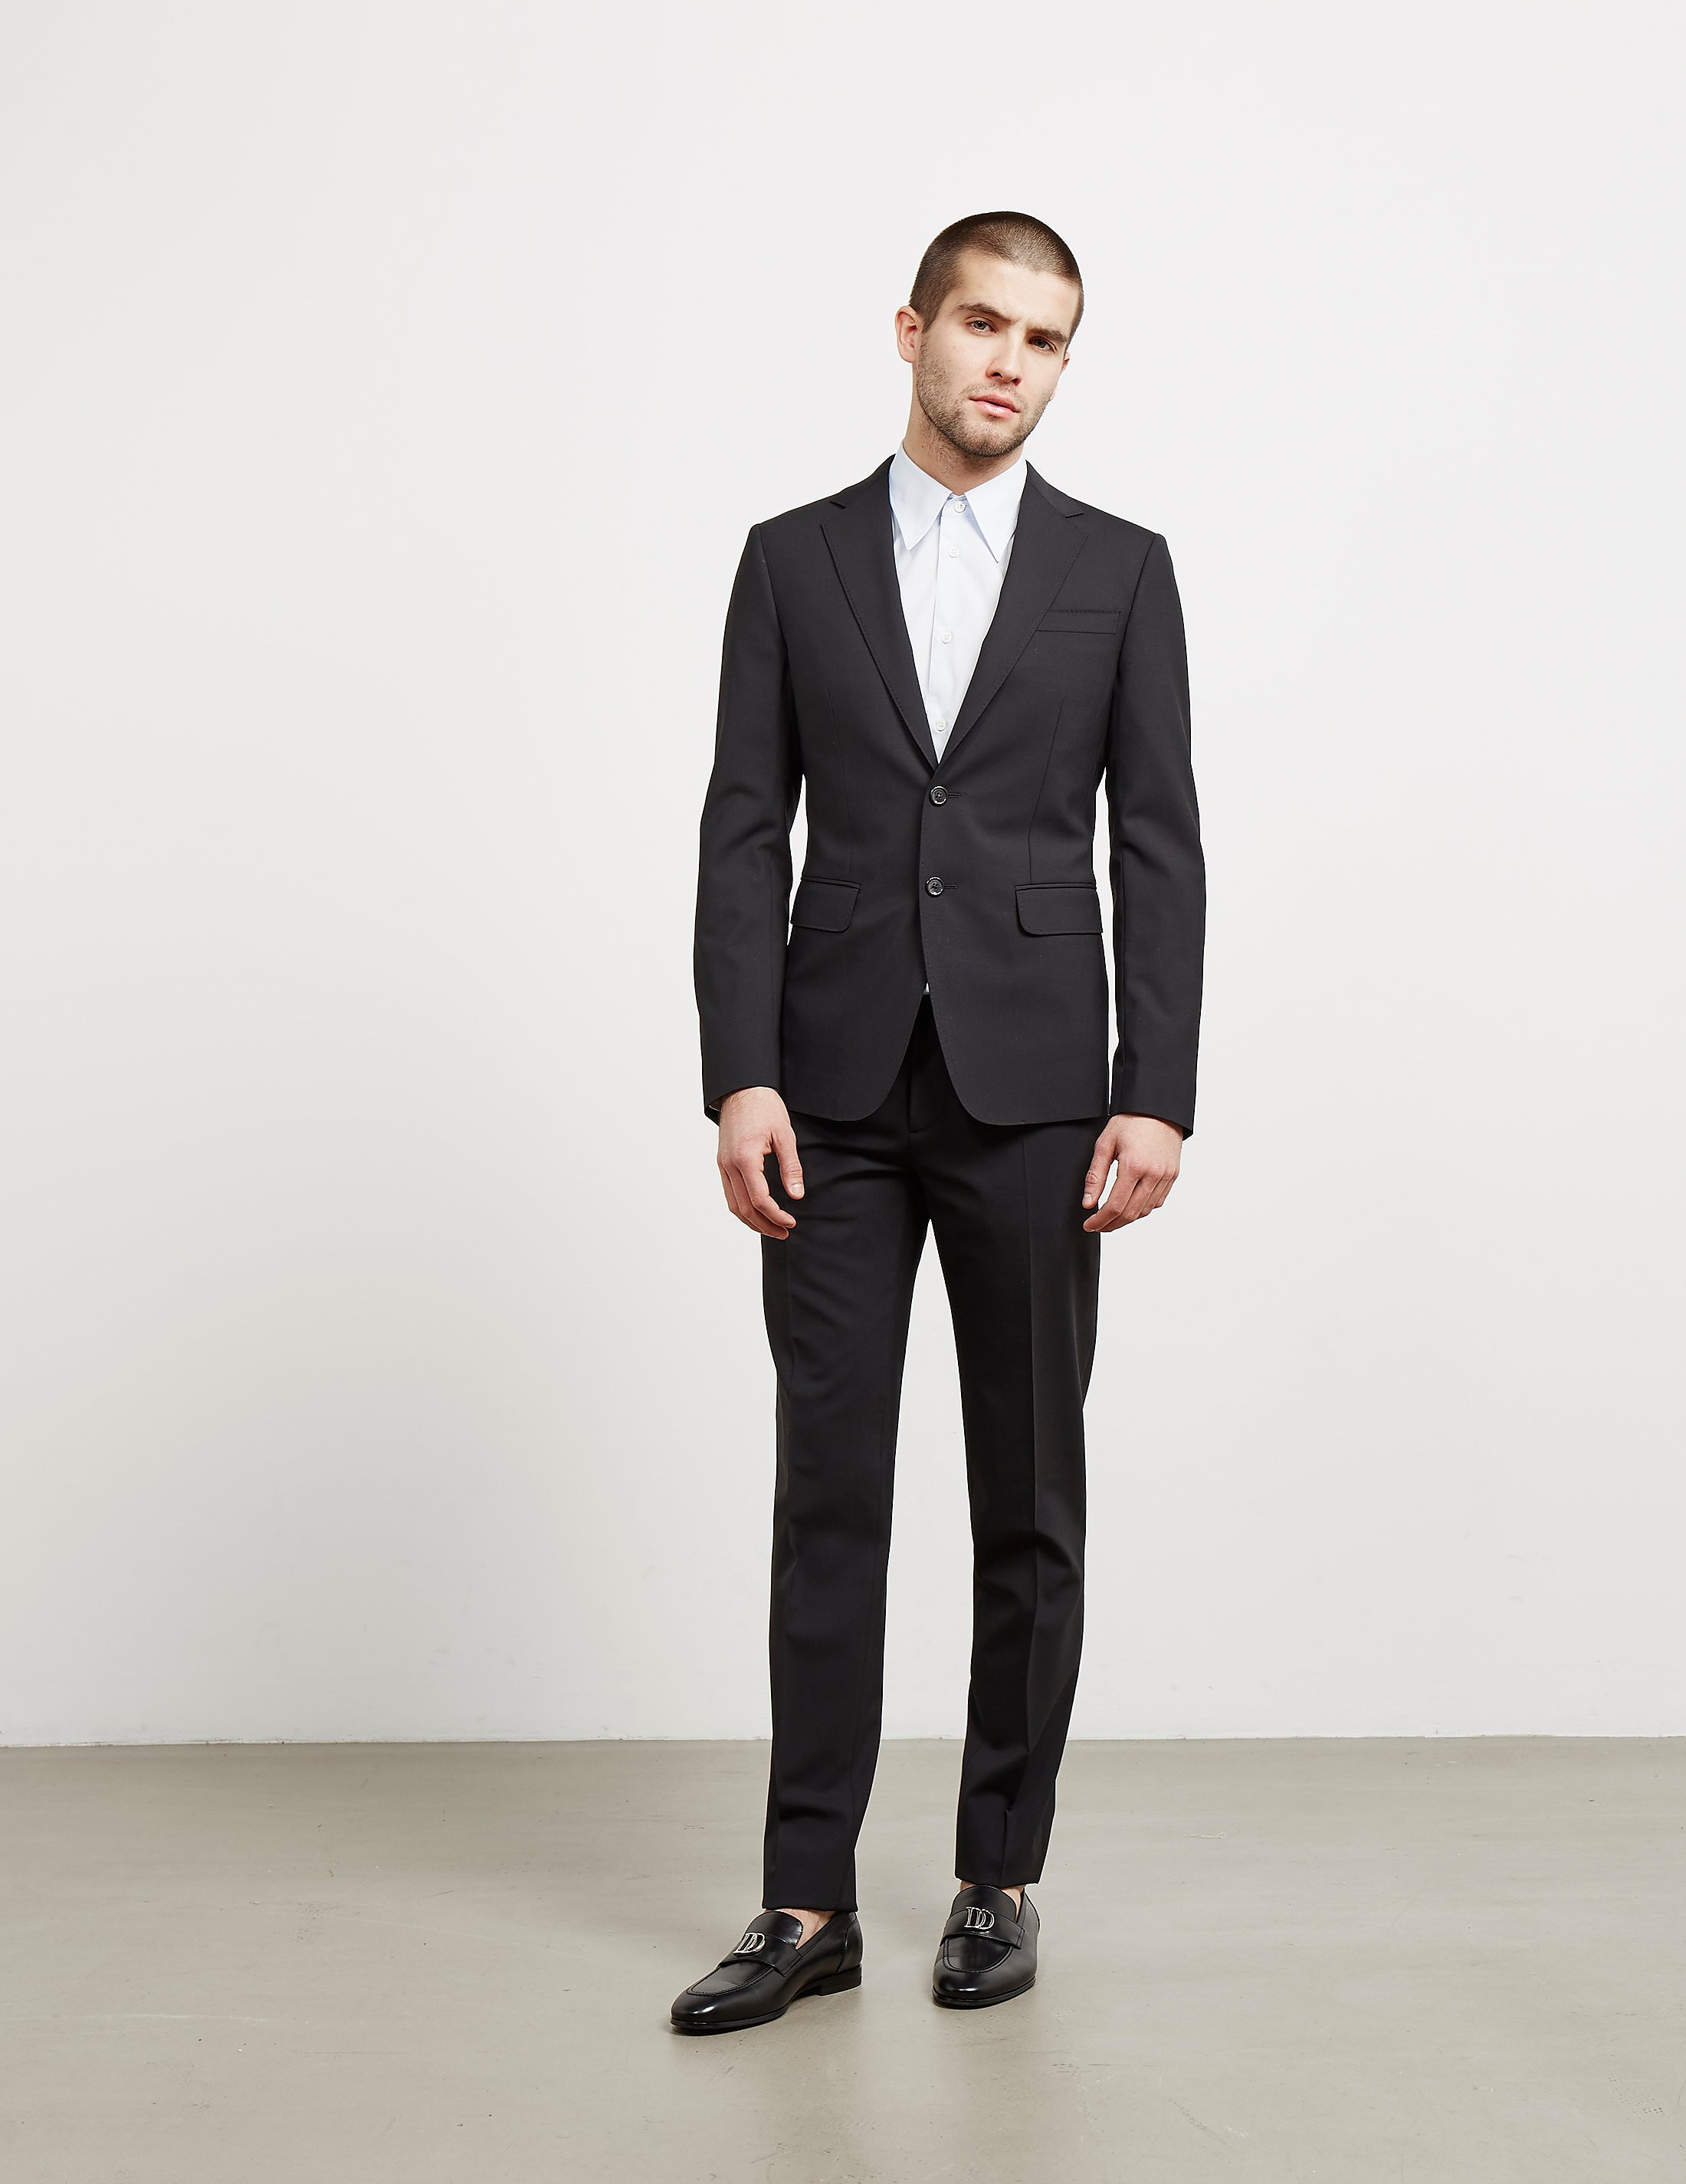 Dsquared2 Manchester Suit - Online Exclusive